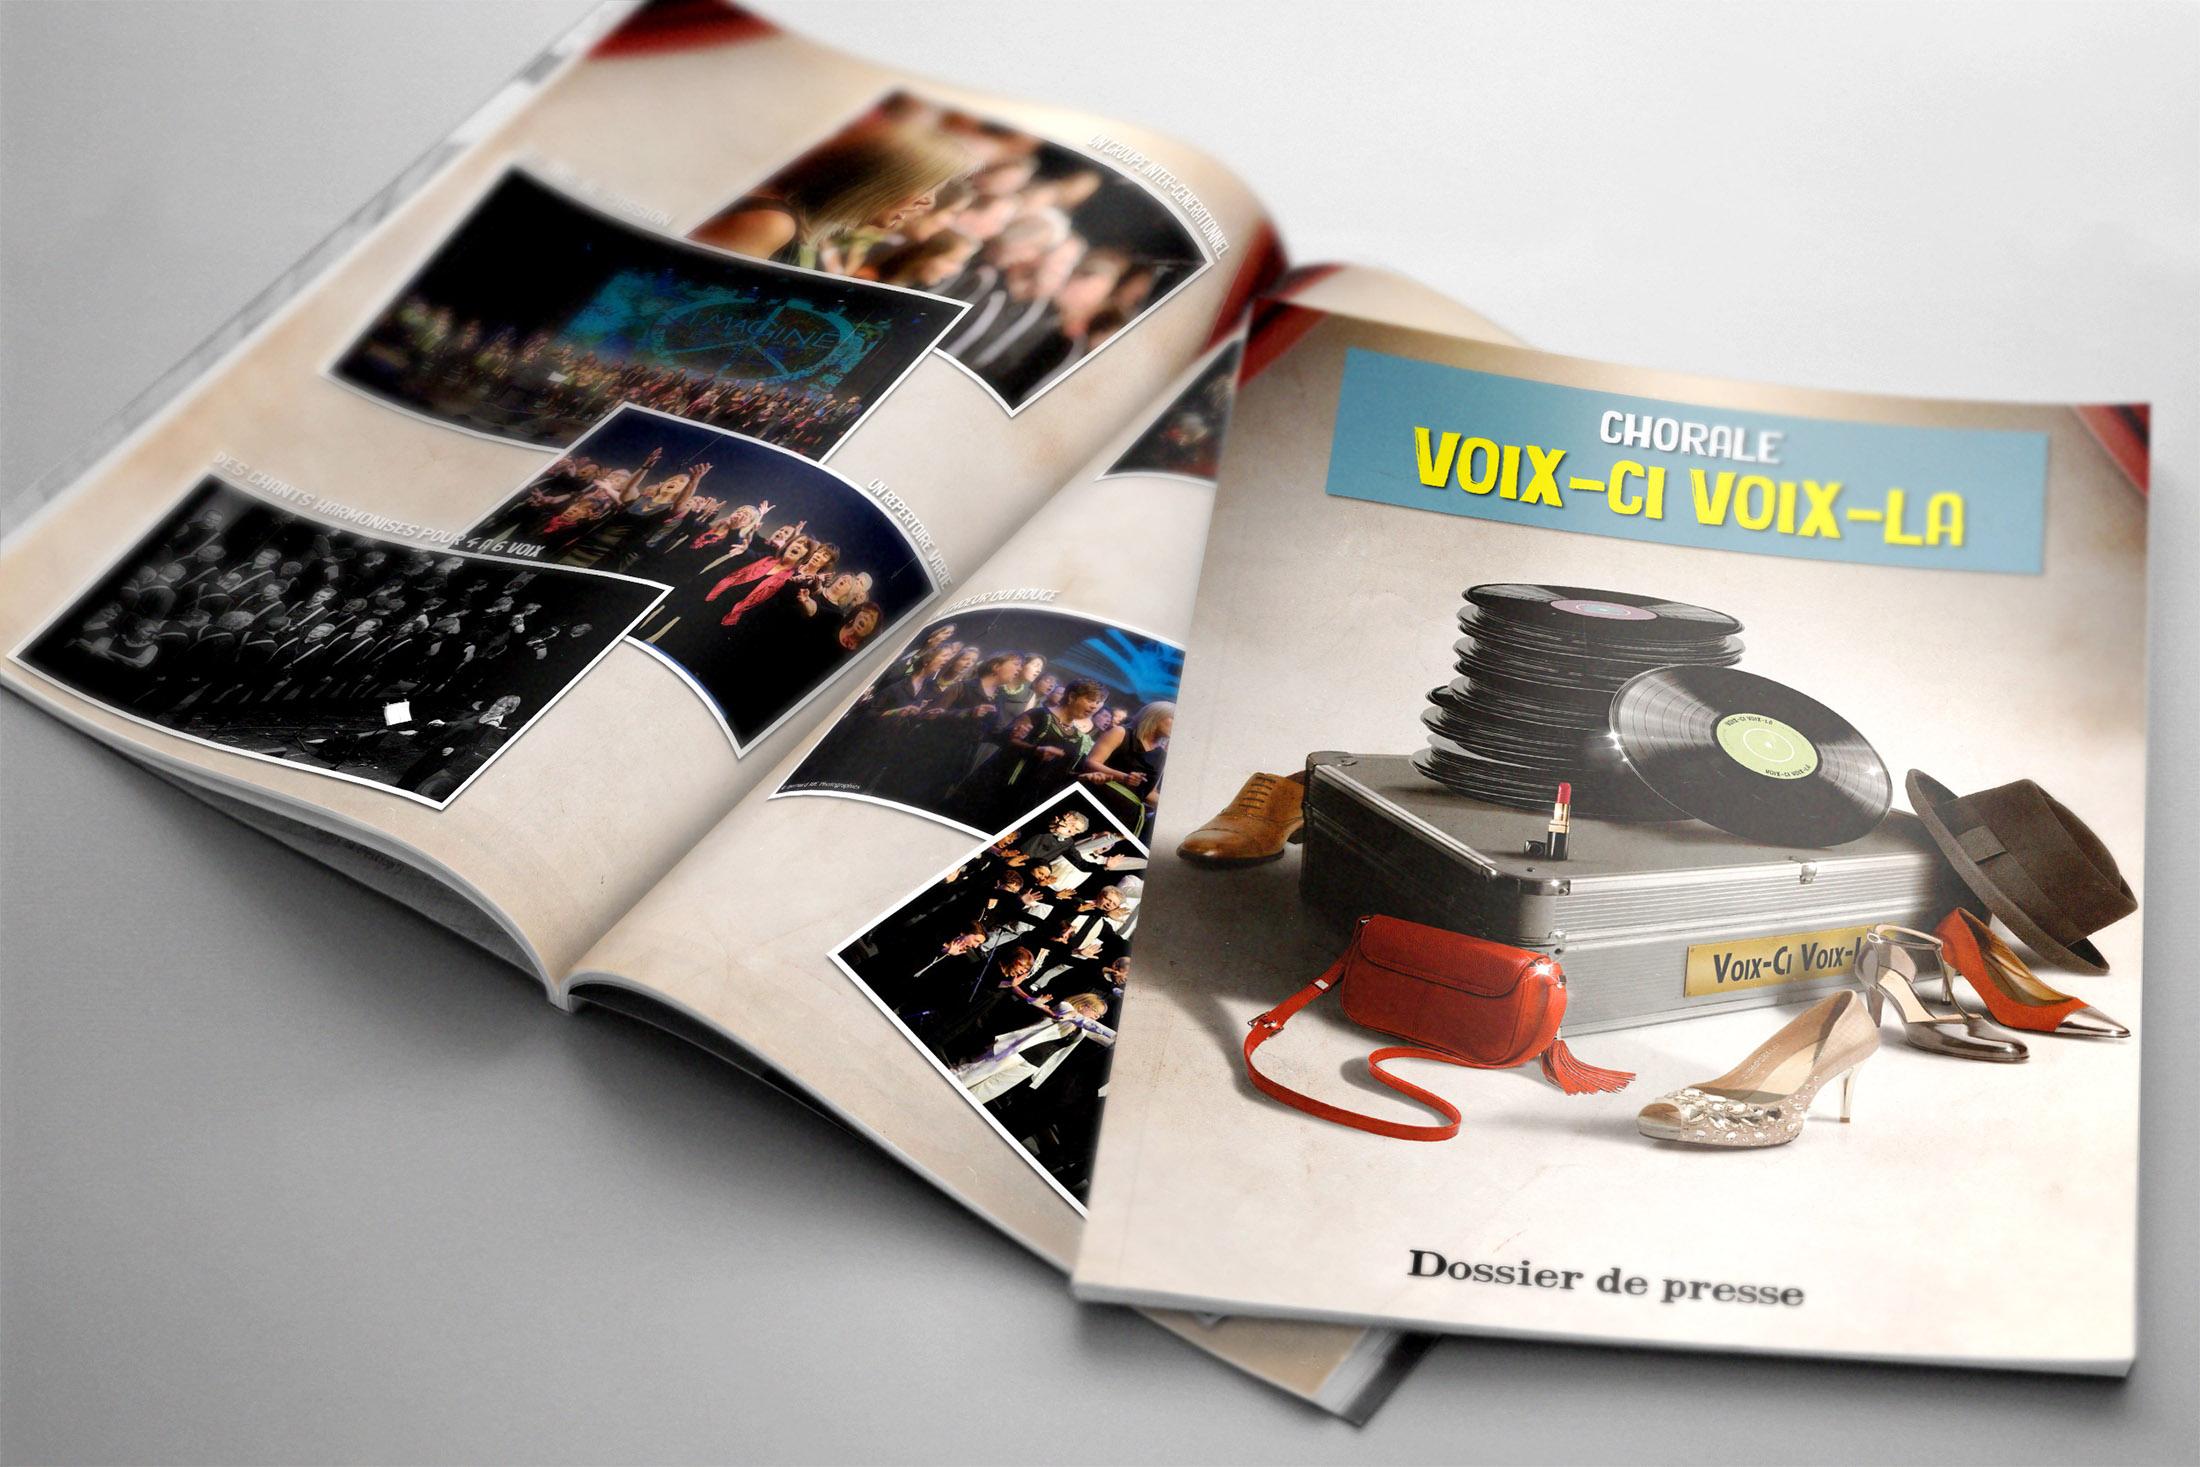 VCVL_dossier-presse_02